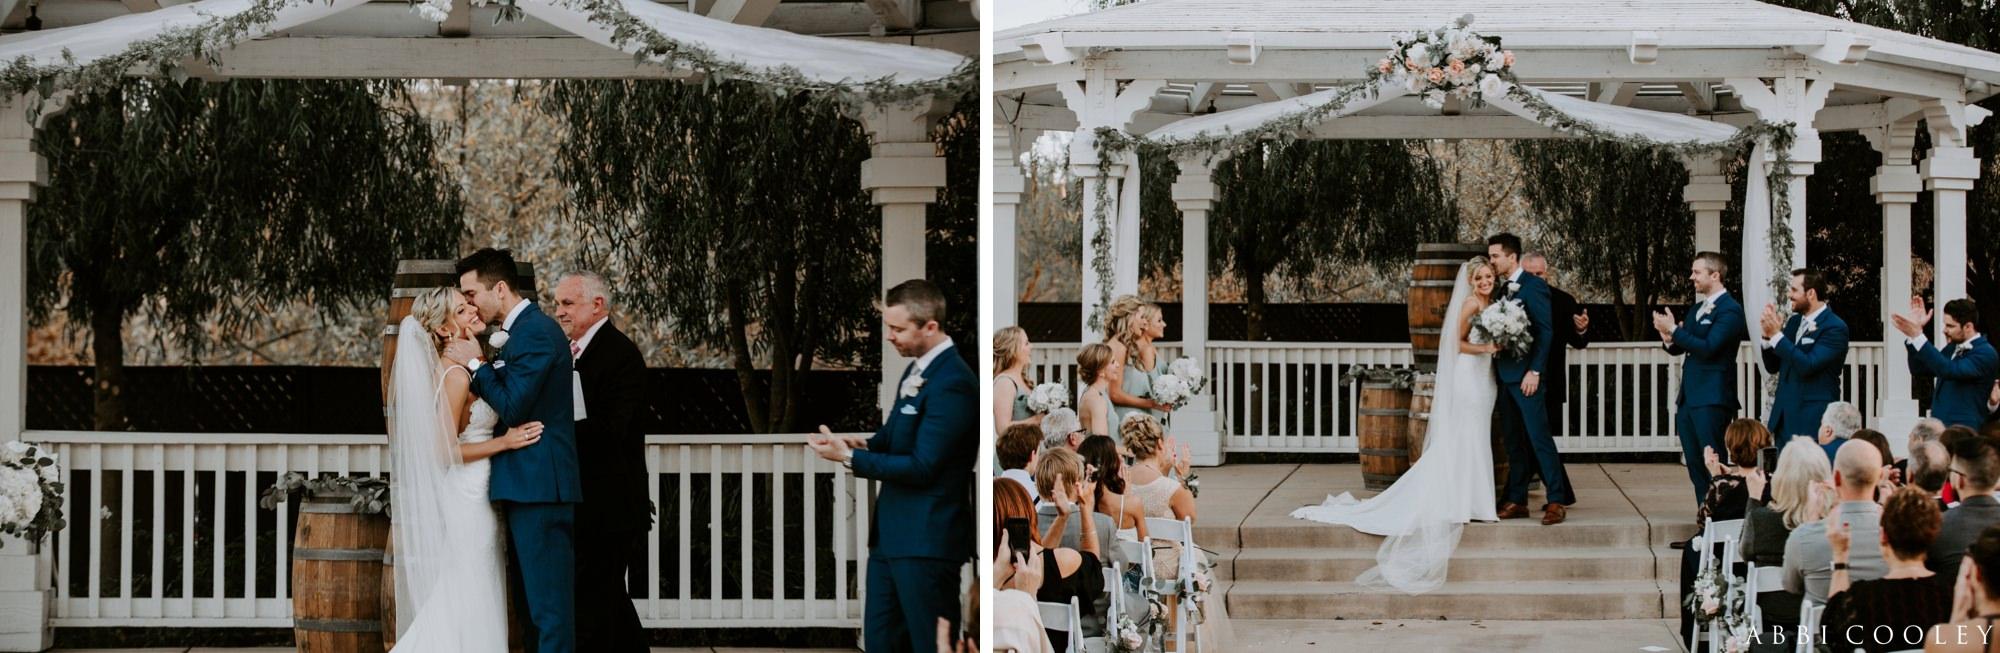 ABBI COOLEY WILSON CREEK WINERY TEMECULA WEDDING_0876